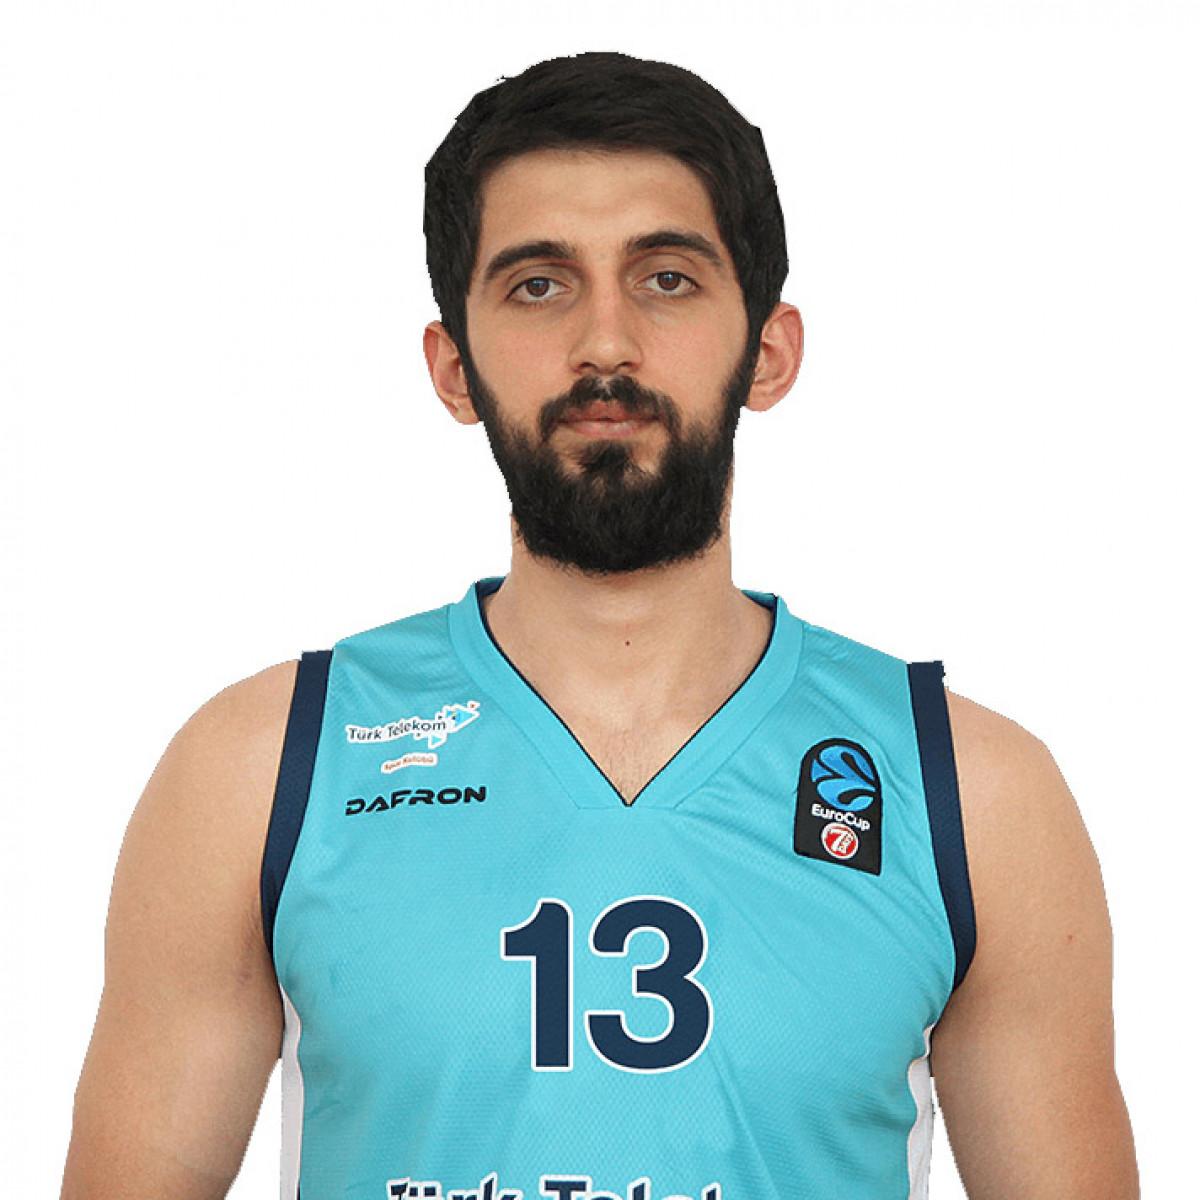 Photo of Ercan Bayrak, 2018-2019 season